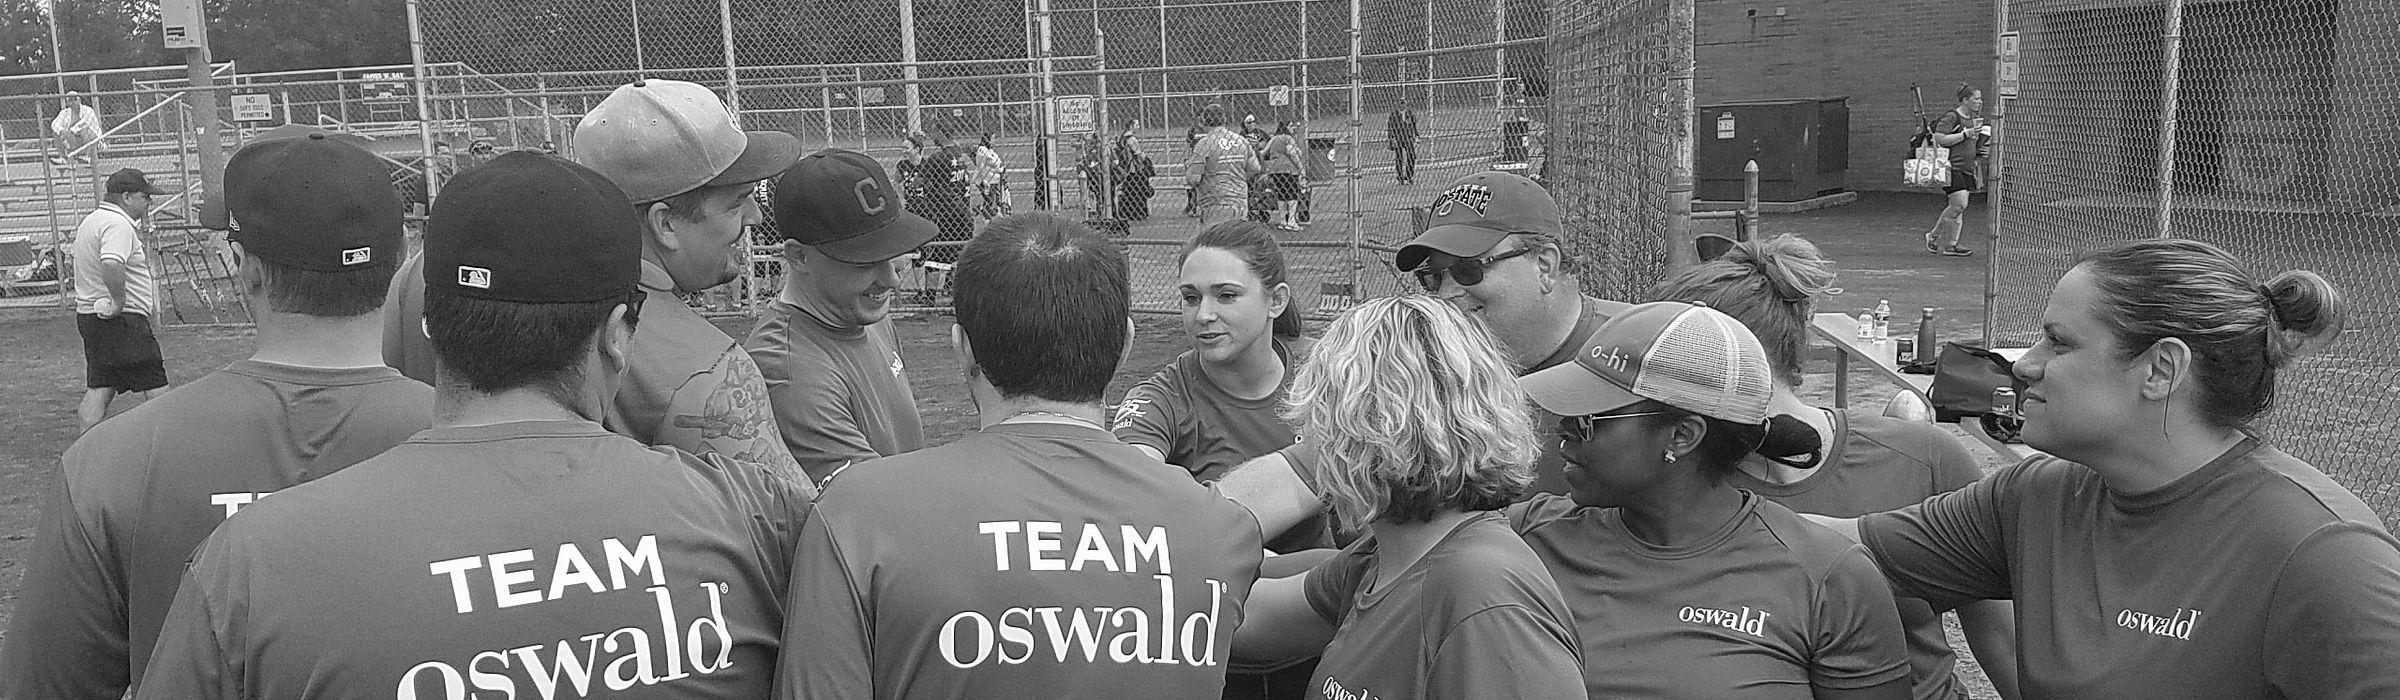 Oswald softball team